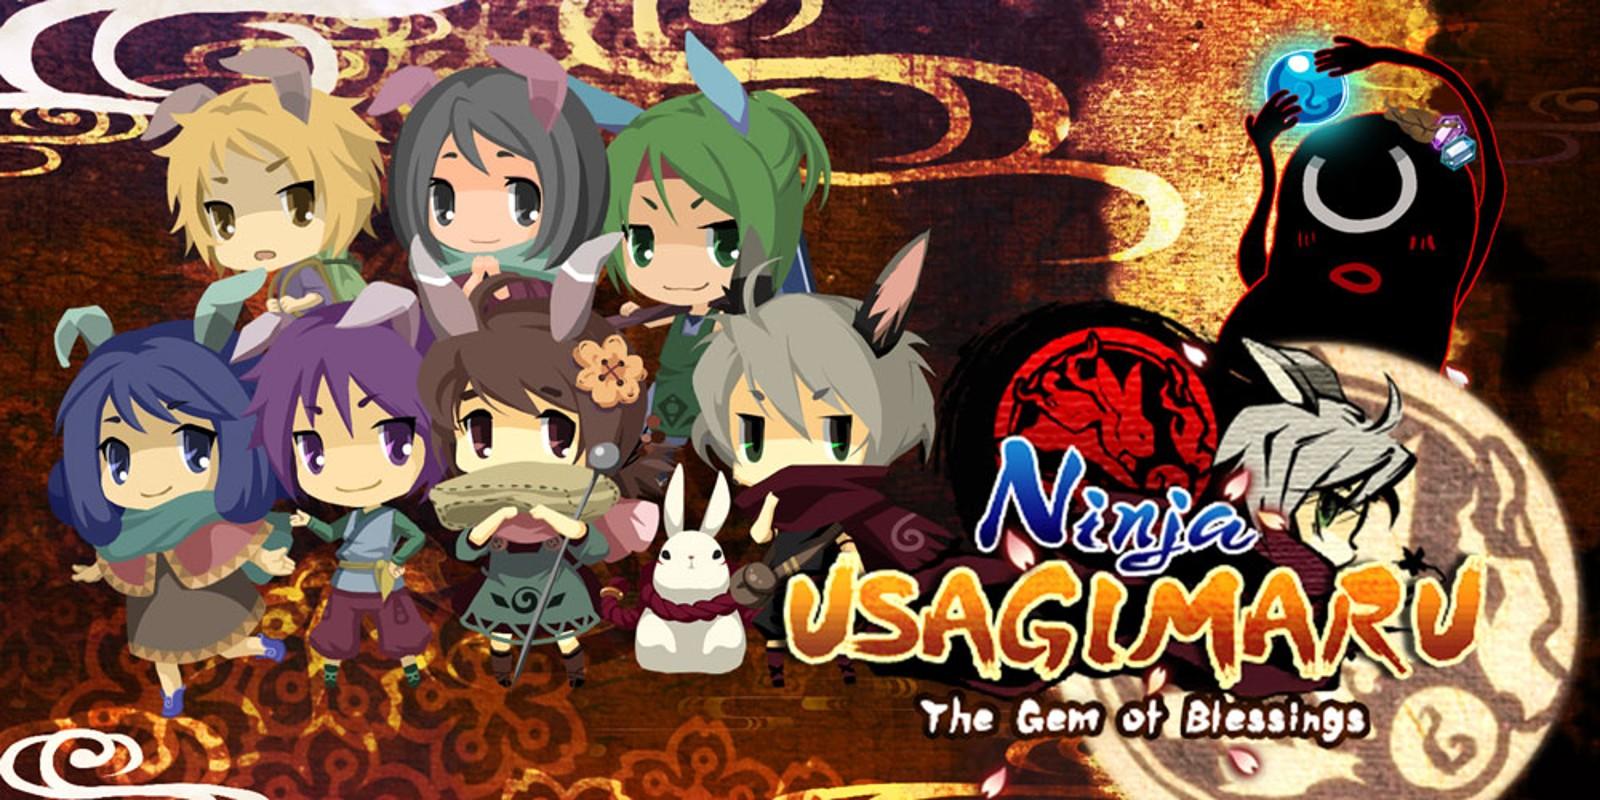 Ninja Usagimaru - The Gem of Blessings -   Nintendo 3DS